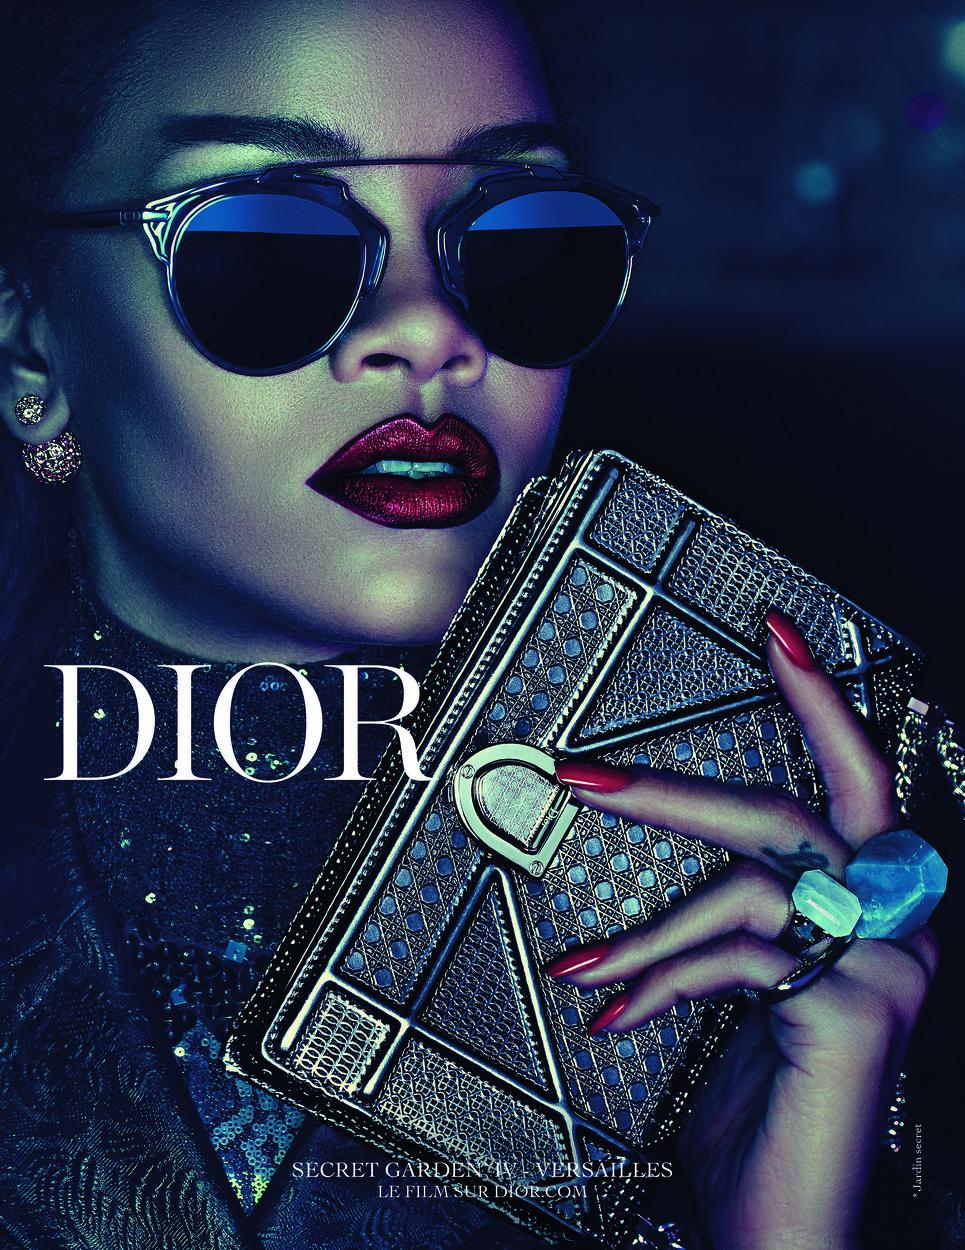 Rihanna X Dior X Sexee Rihanna Rihanna News Rihanna Fenty